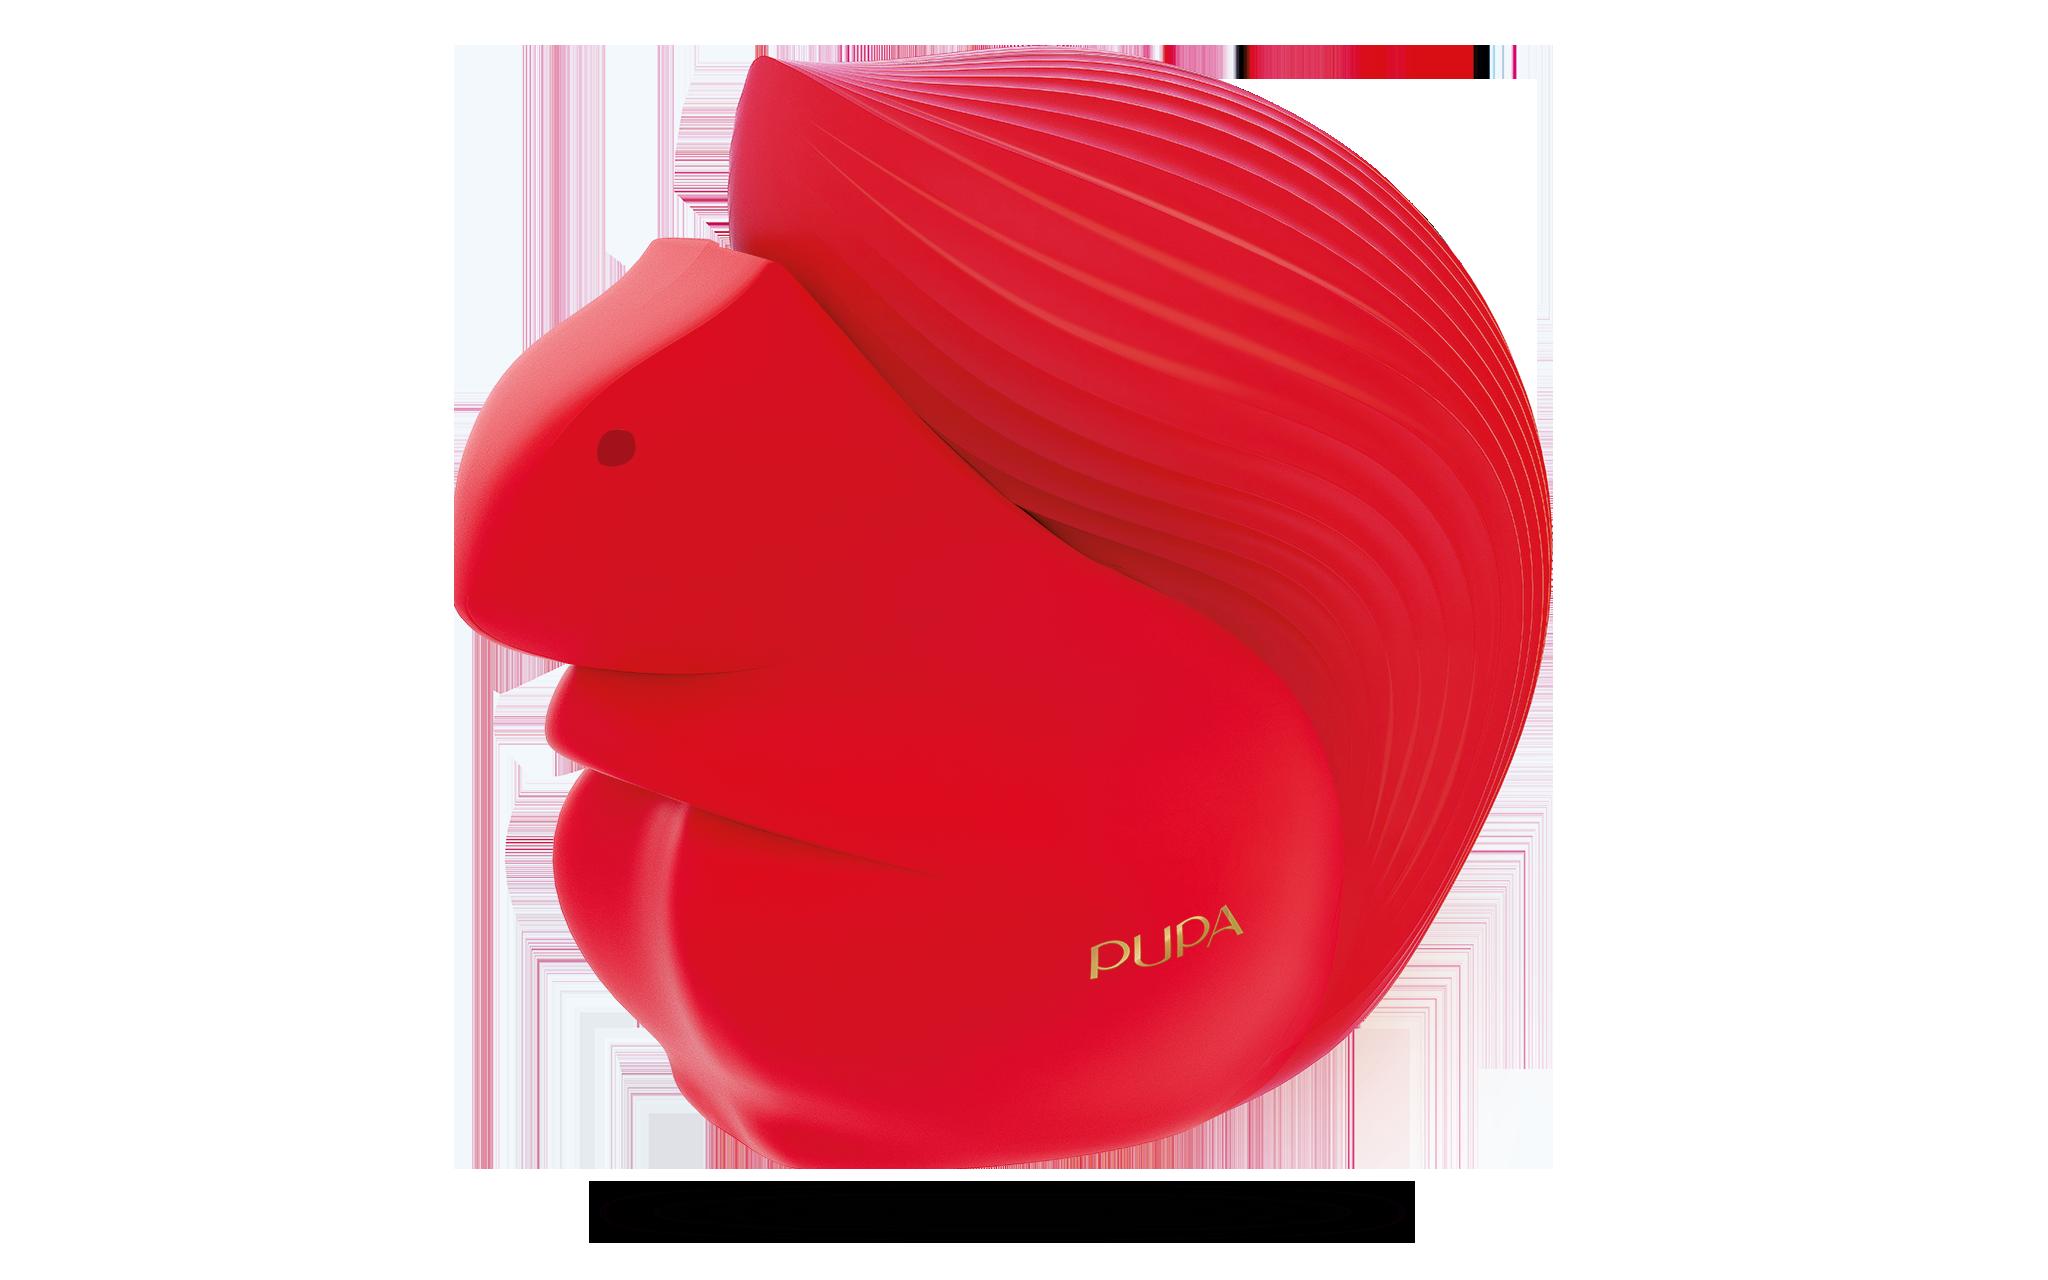 Pupa Squirrel 3 - PUPA Milano